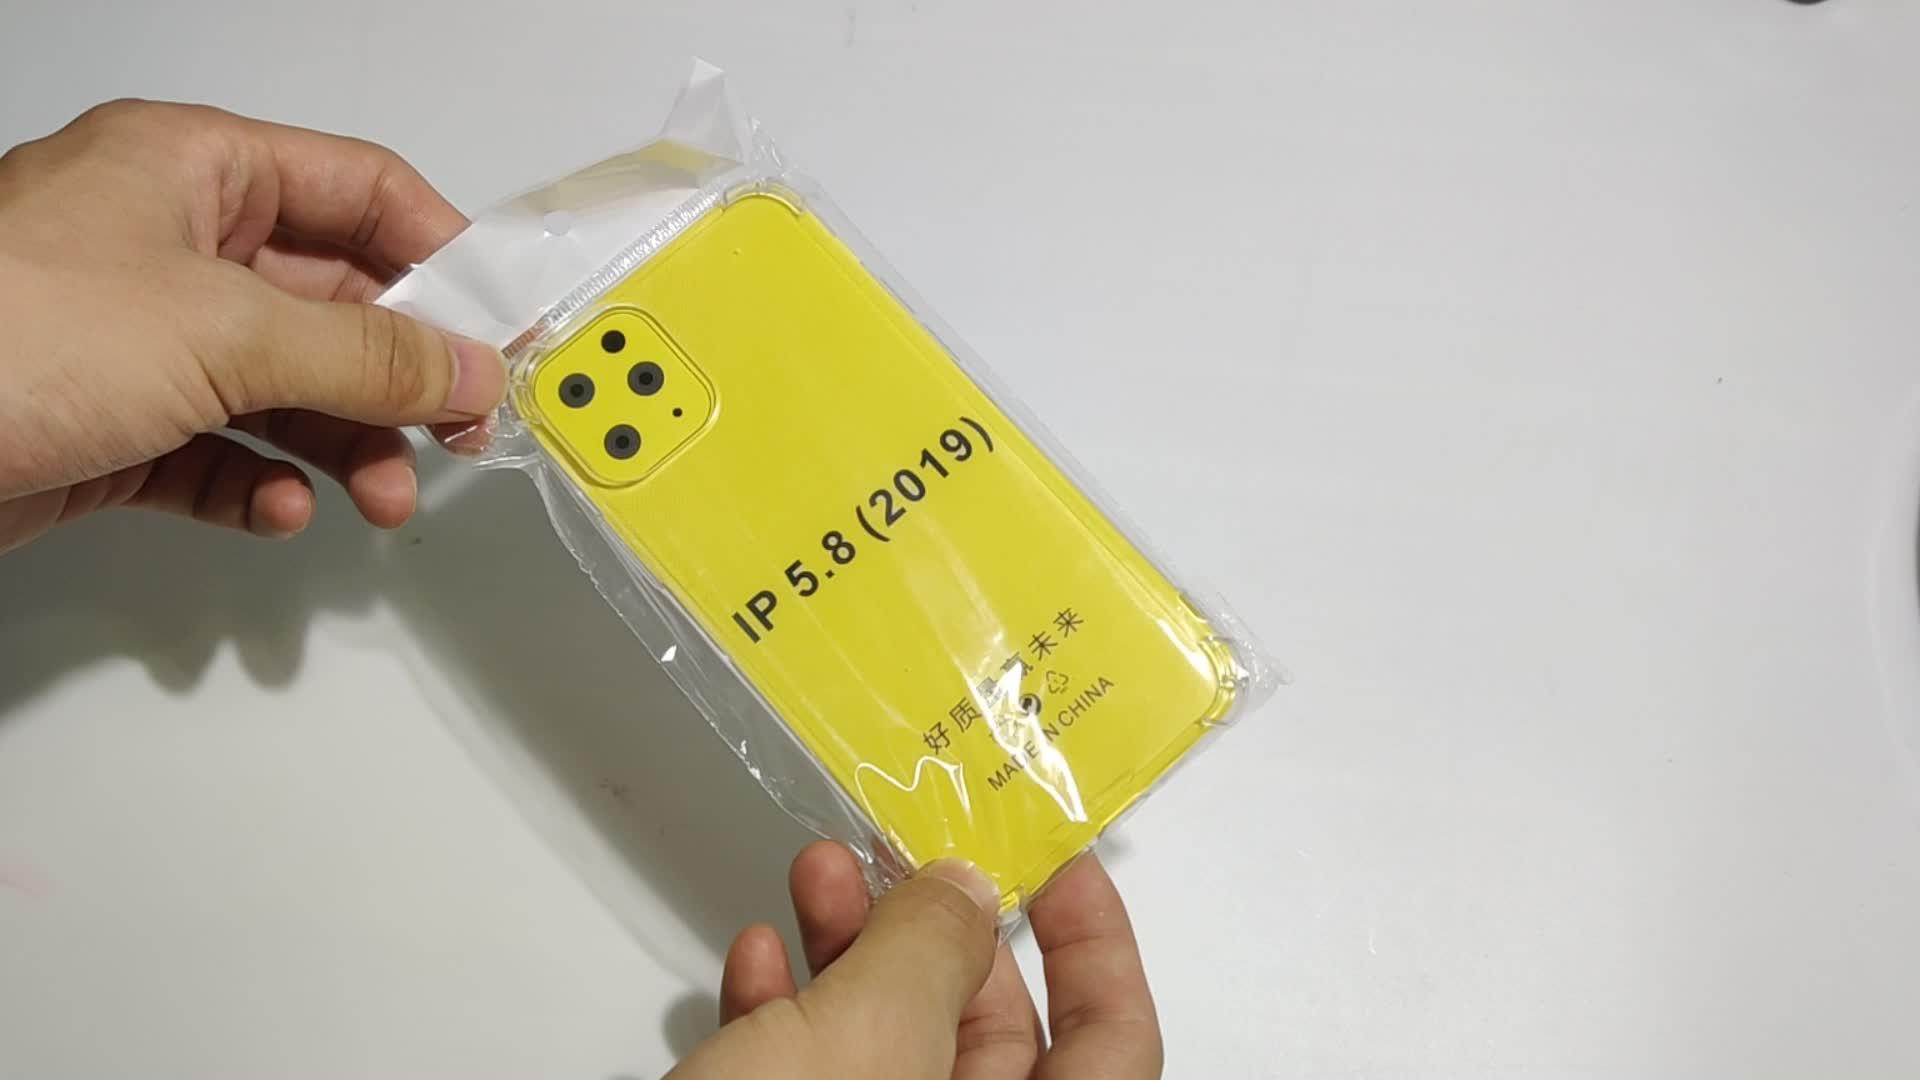 Anti-knock Lembut TPU Transparan Bening Phone Case Melindungi Cover Lembut Shockproof Case Untuk iPhone 12 11 pro max 7 8 plus X XS SE2